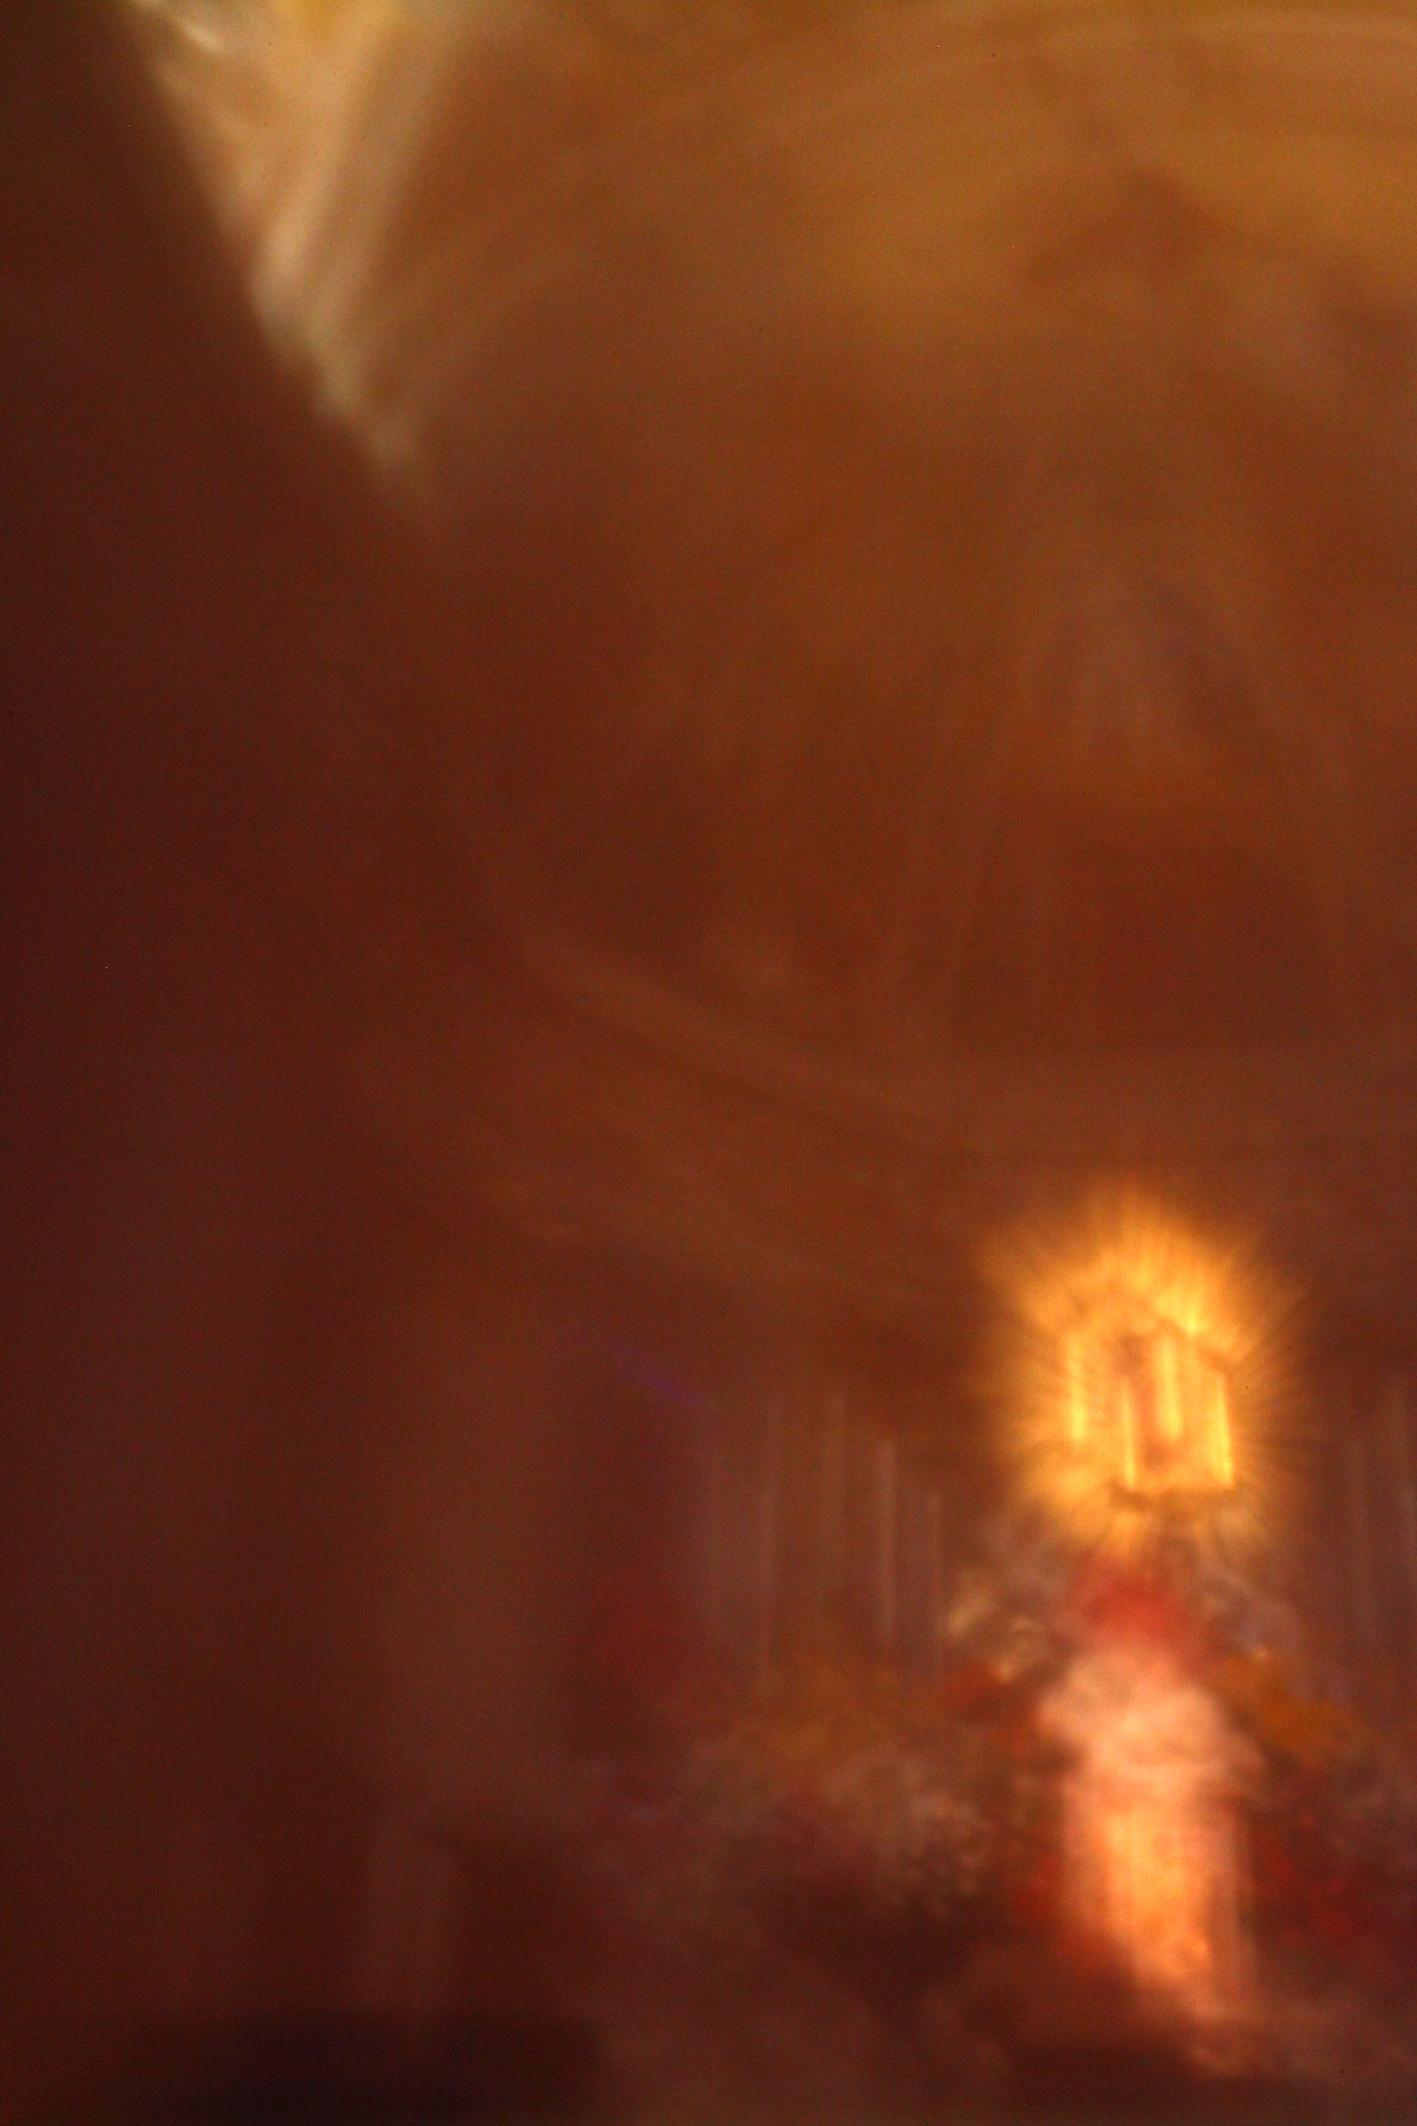 'St. Ambroggio', 2011/15, Pinhole photograph, laser-print on 180gsm cartridge paper, 12 x 18 cm